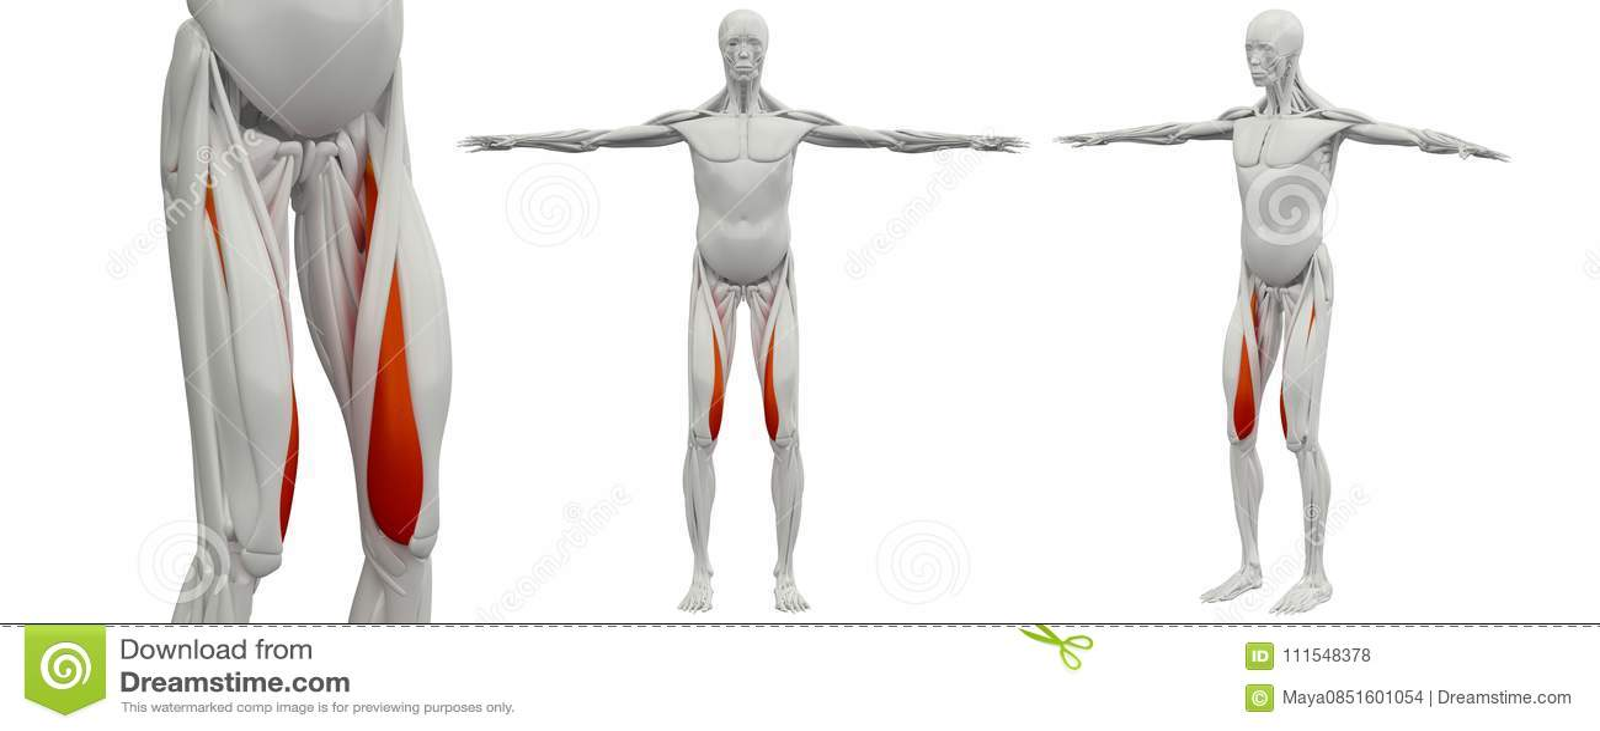 3d Rendering Illustration Of The Vastus Medialis Stock Illustration ...